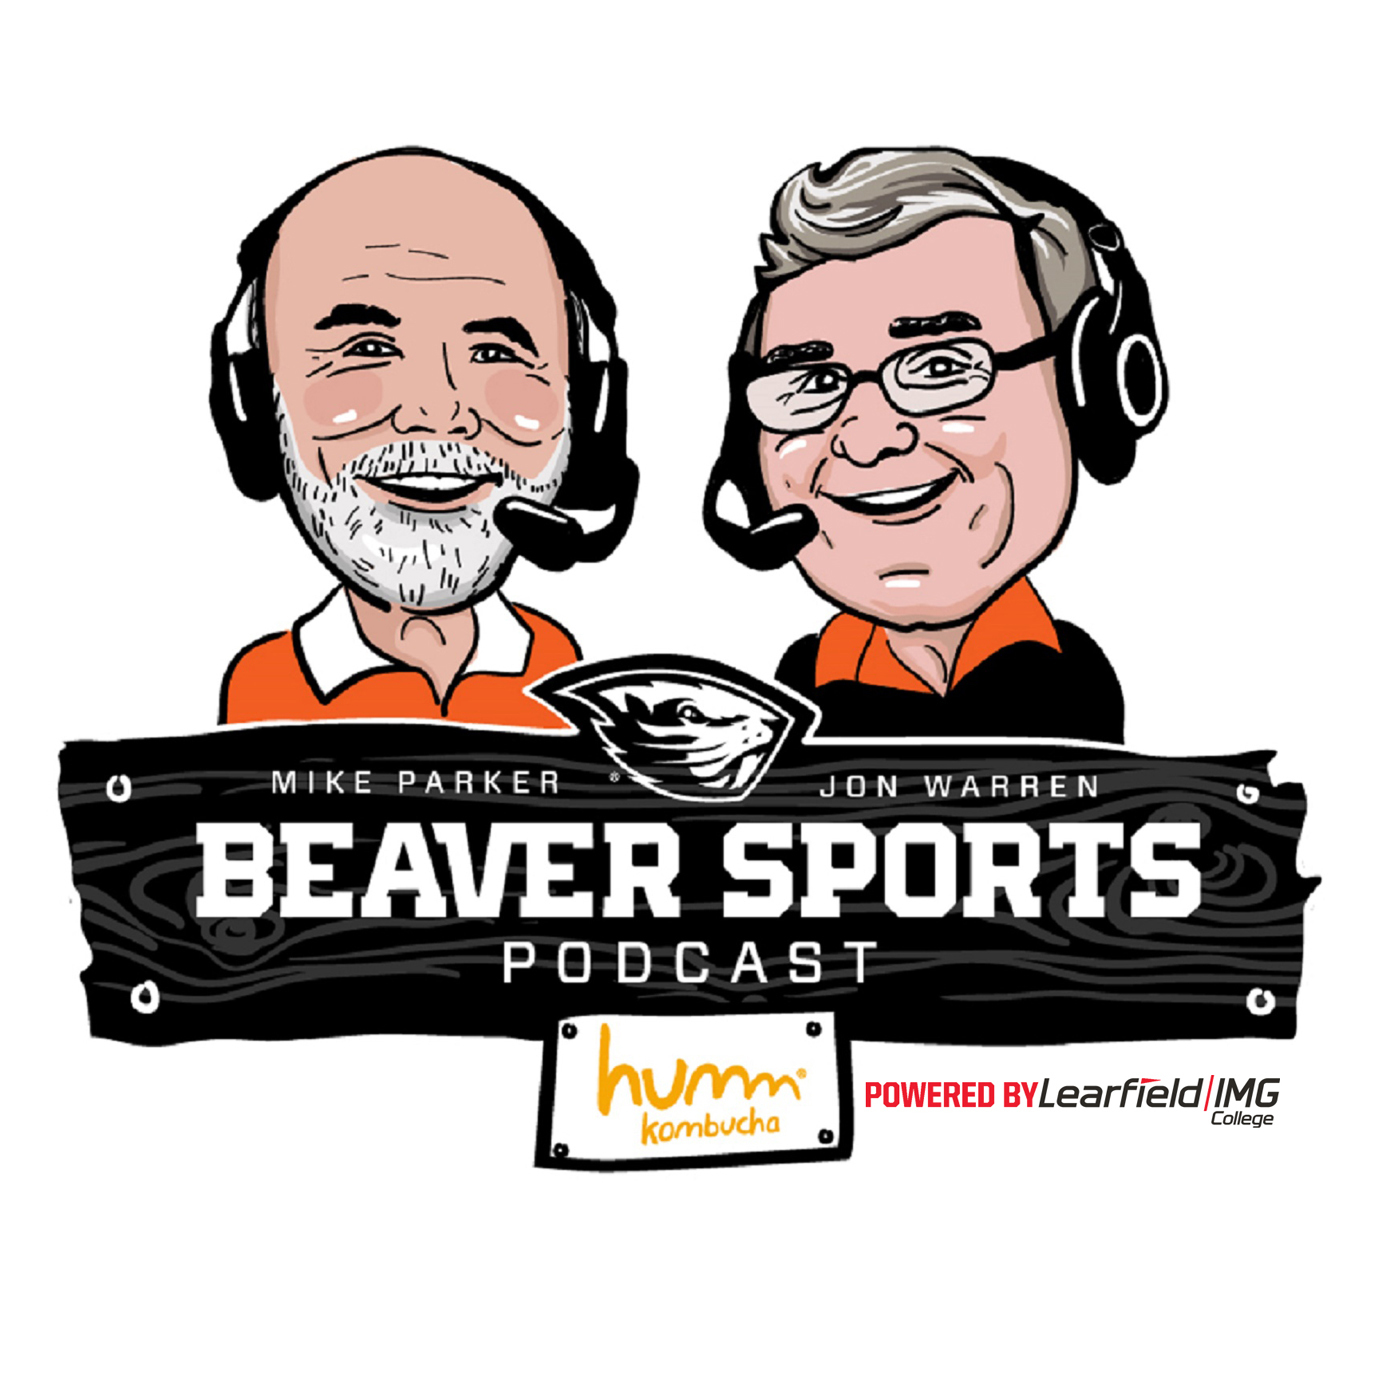 Beaver Sports Podcast